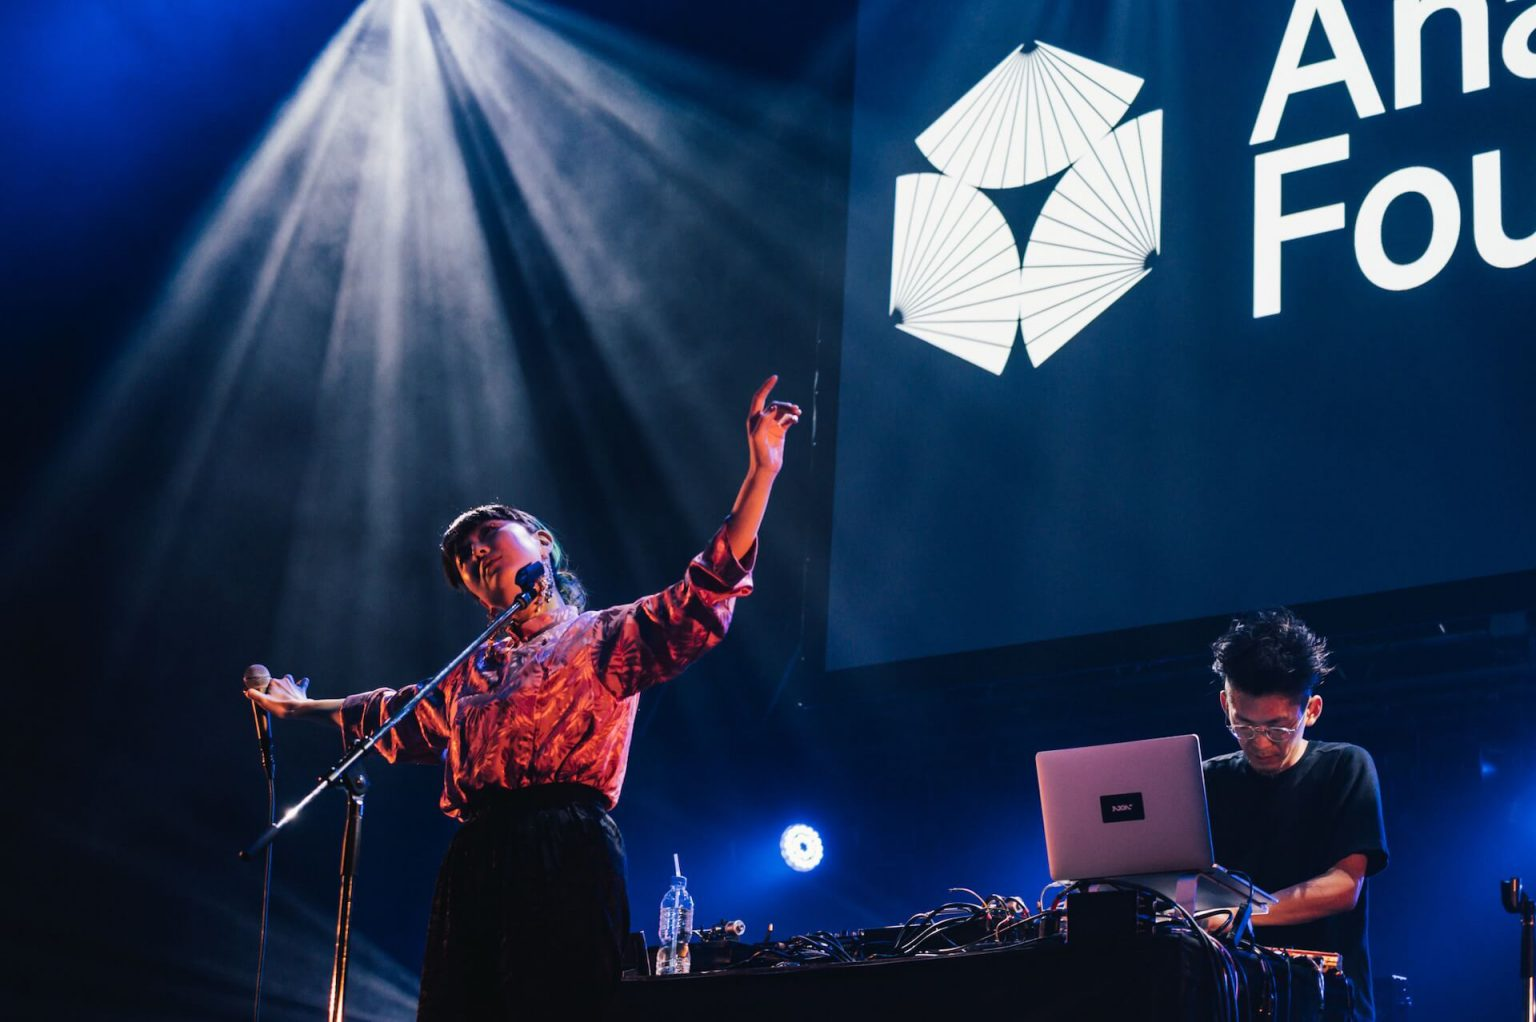 20191102_qetic-al-12-1440x959 レコード市と音楽パフォーマンスを同時に楽しめるレコード・フェス:Discogs Presents Mystic Crates